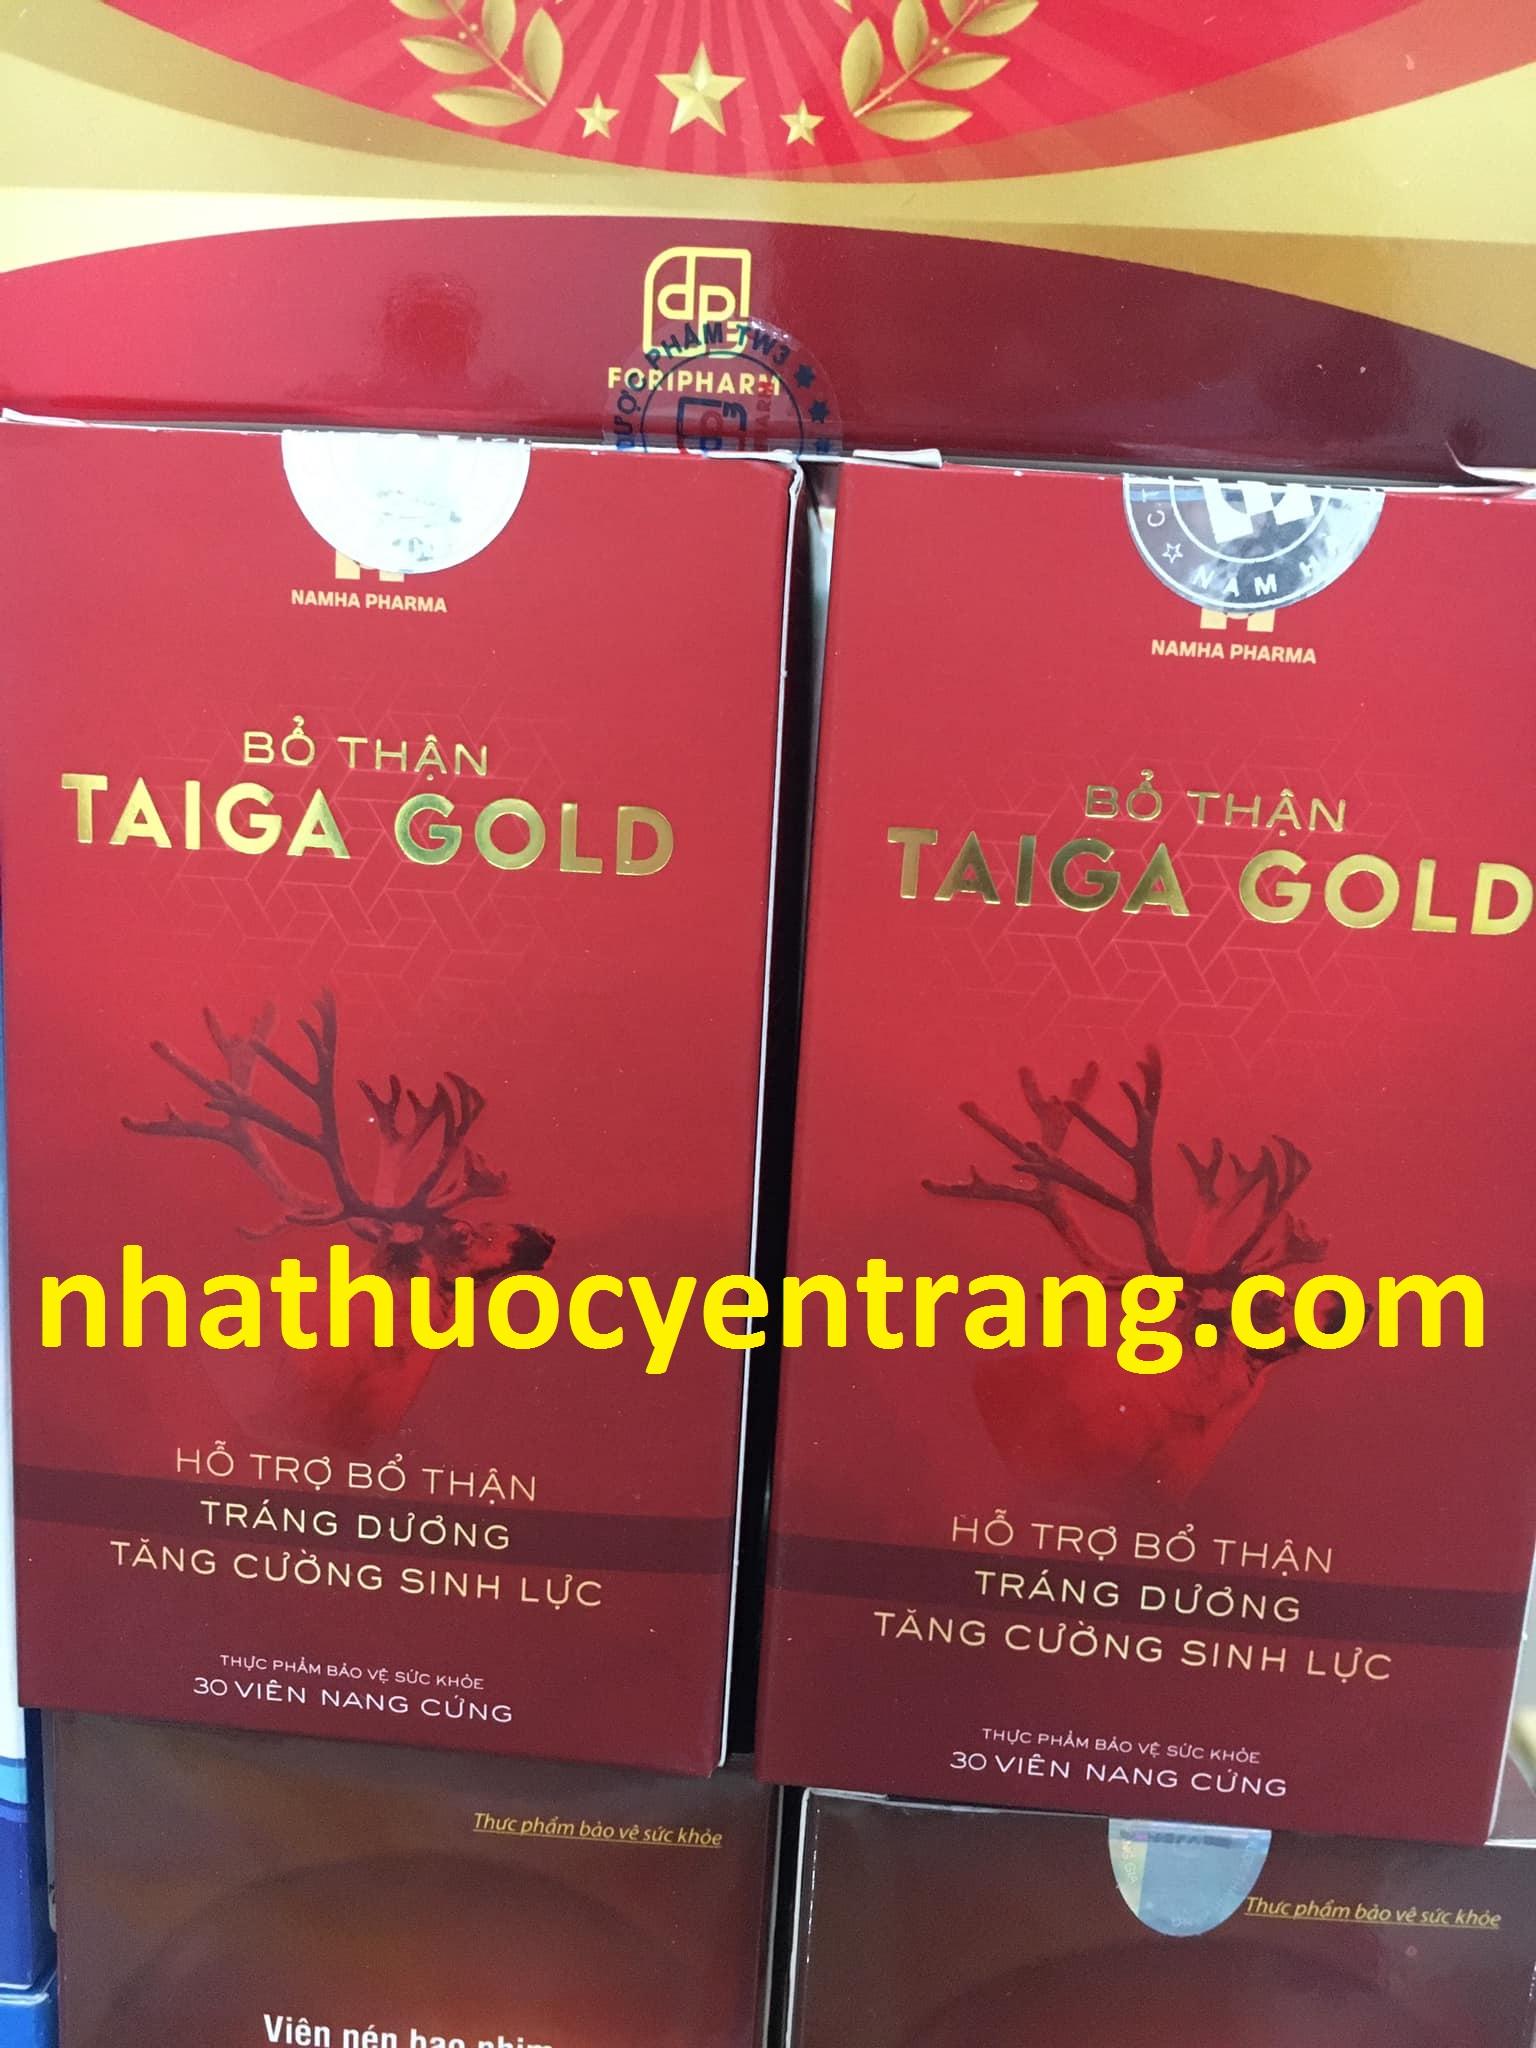 Bổ Thận Taiga Gold